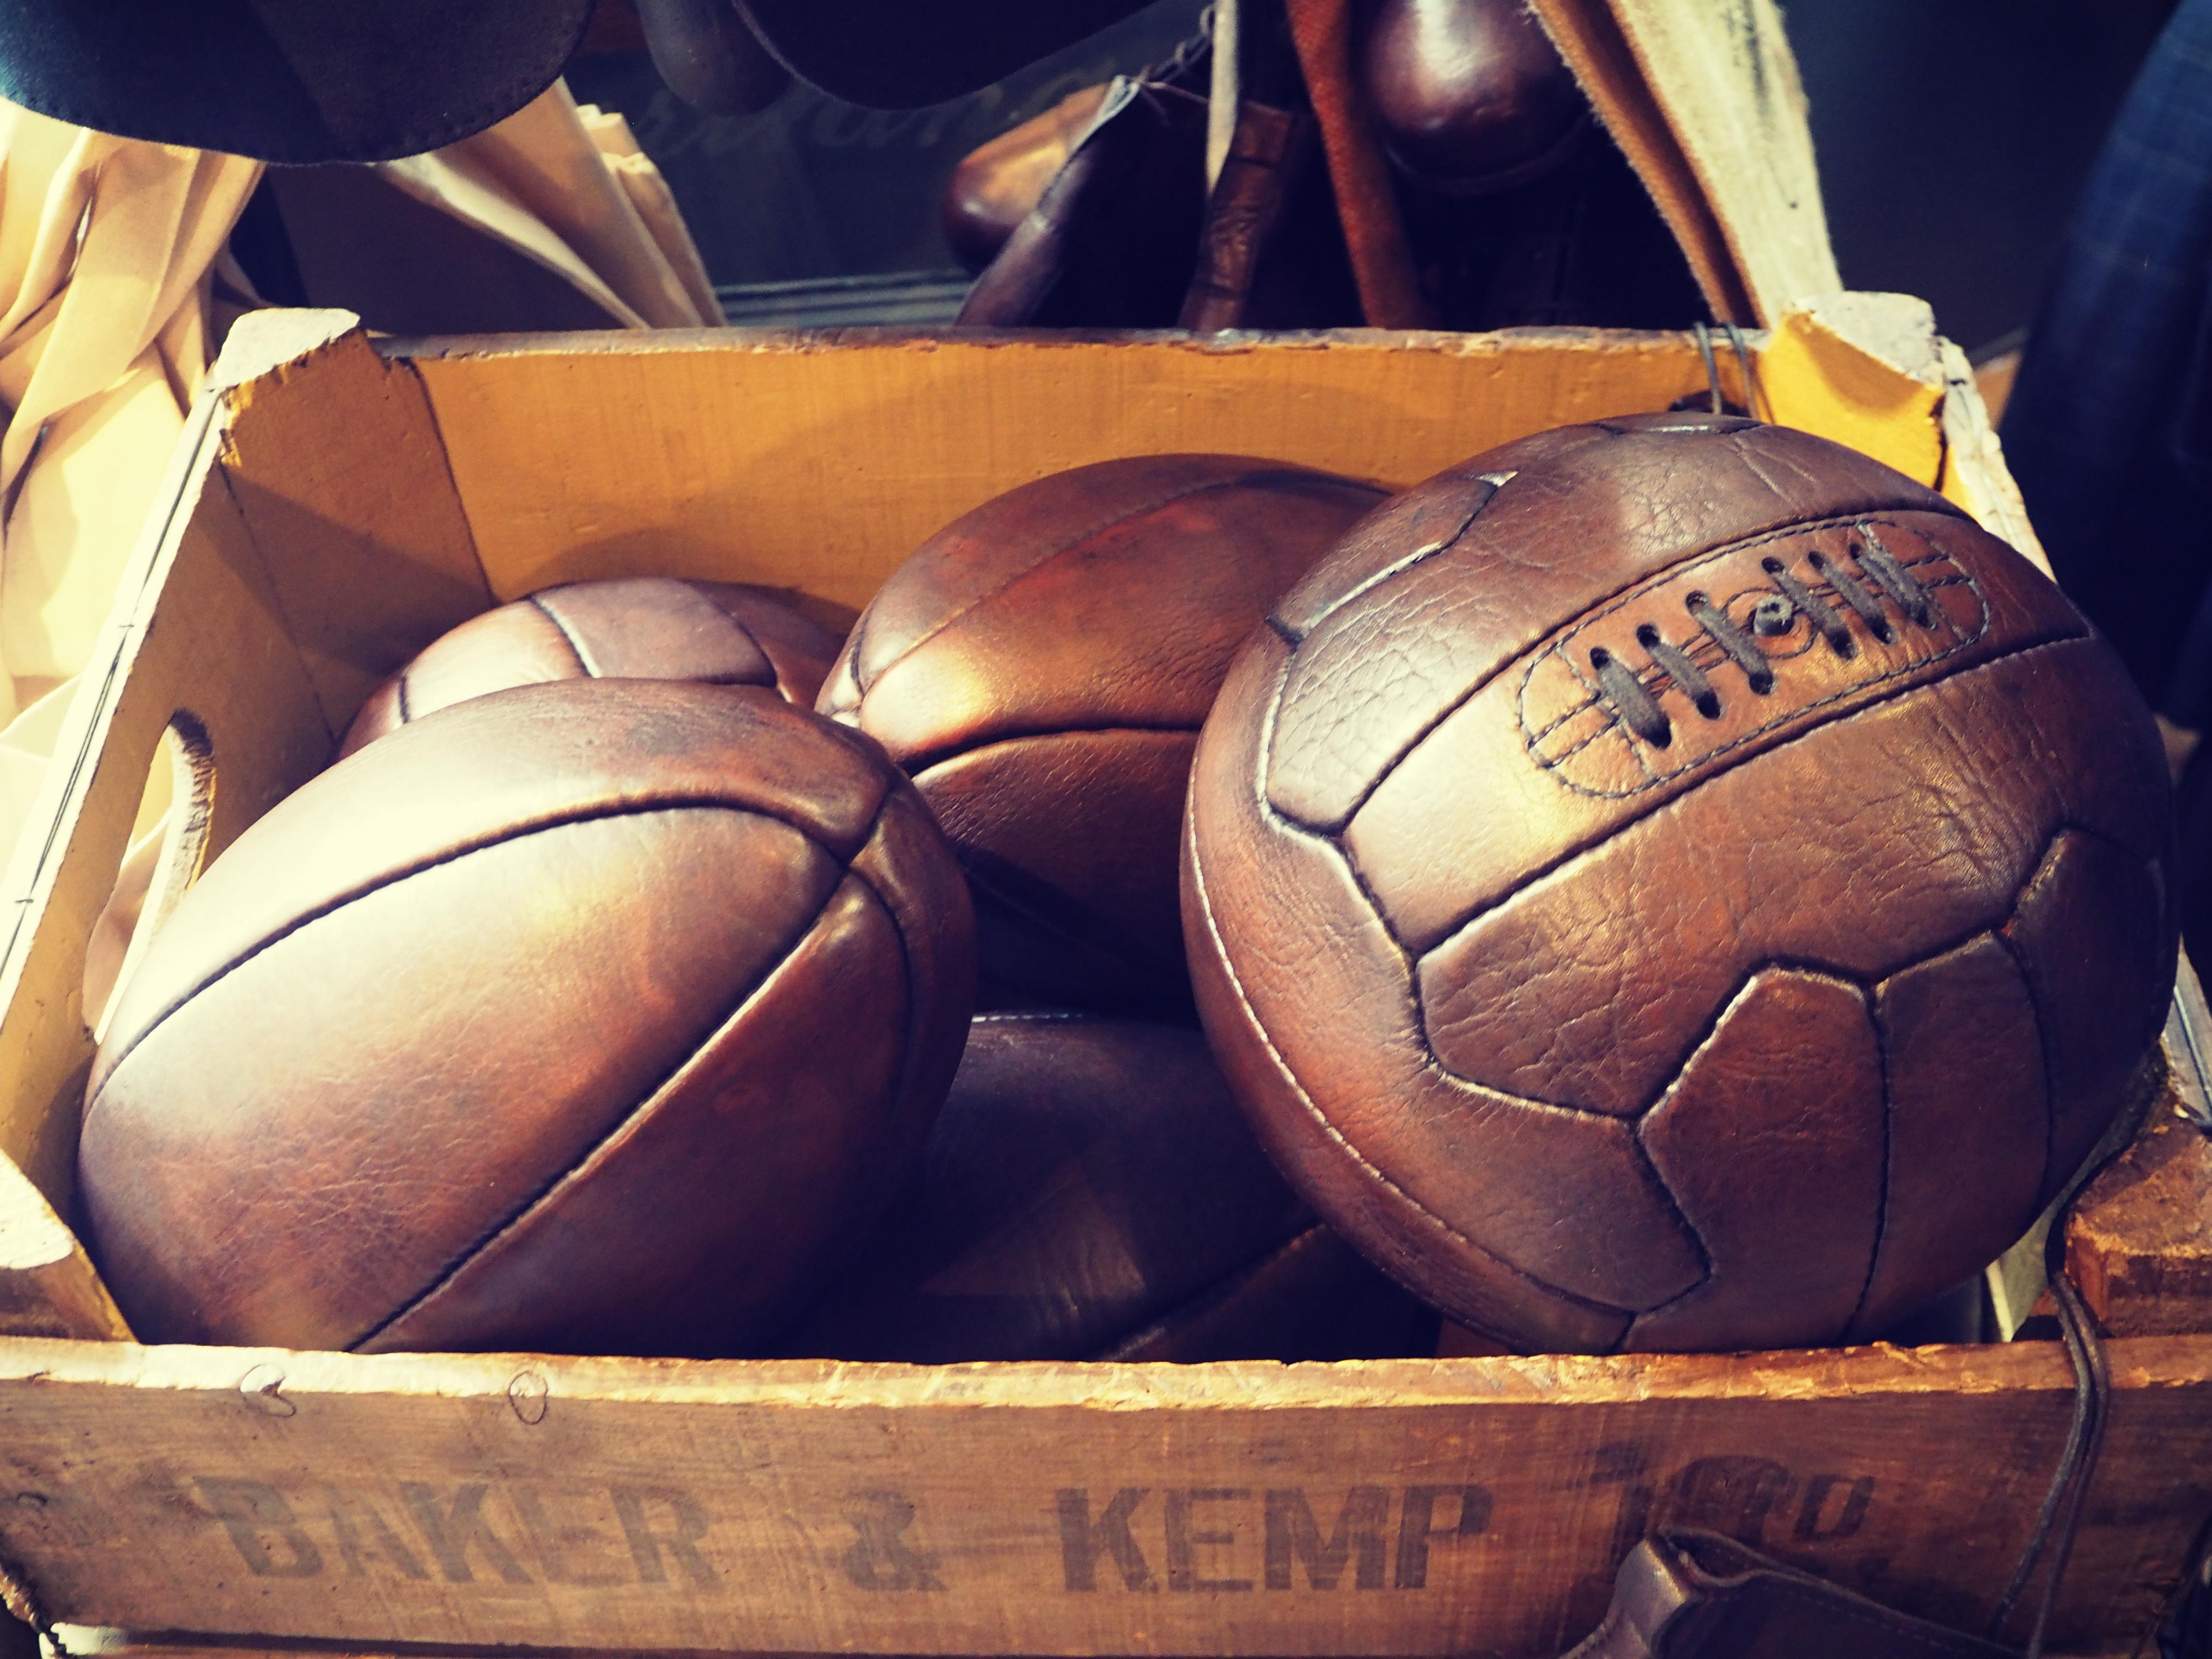 thomas-farthing-balls